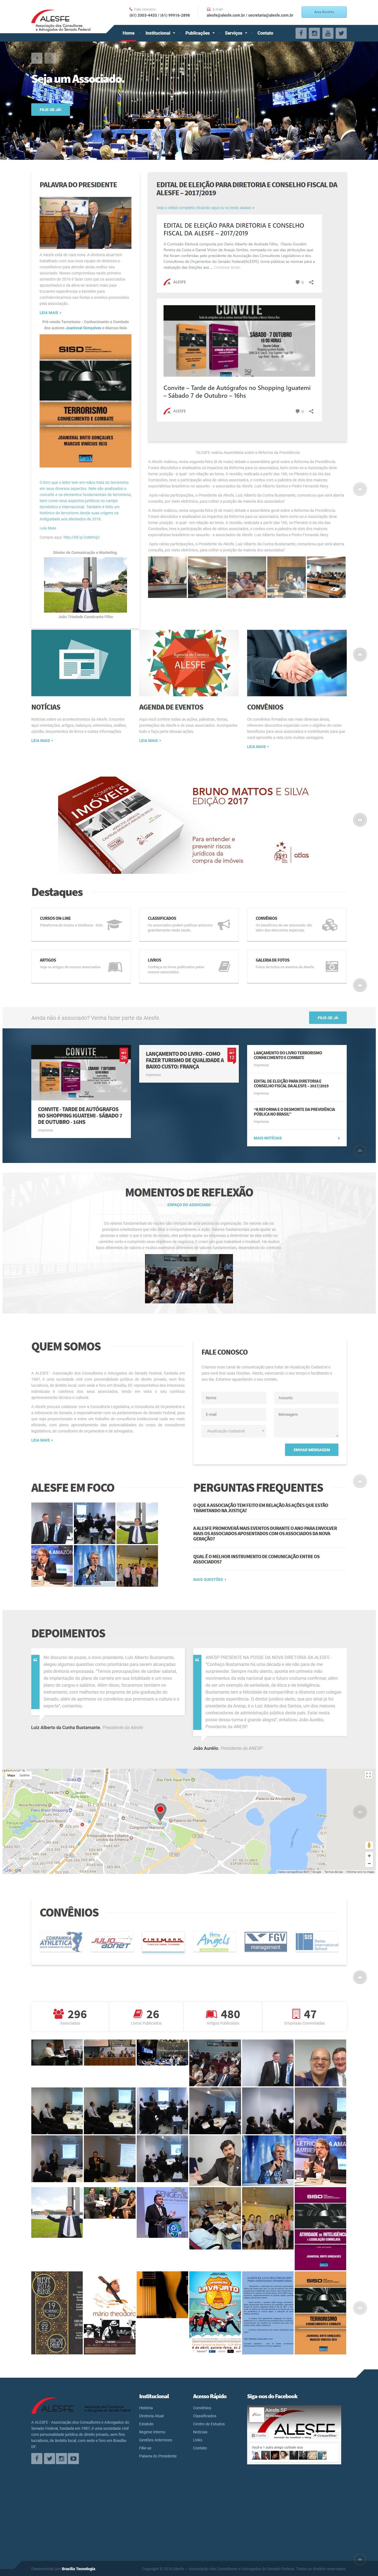 alesfe1-brasilia-tecnologia